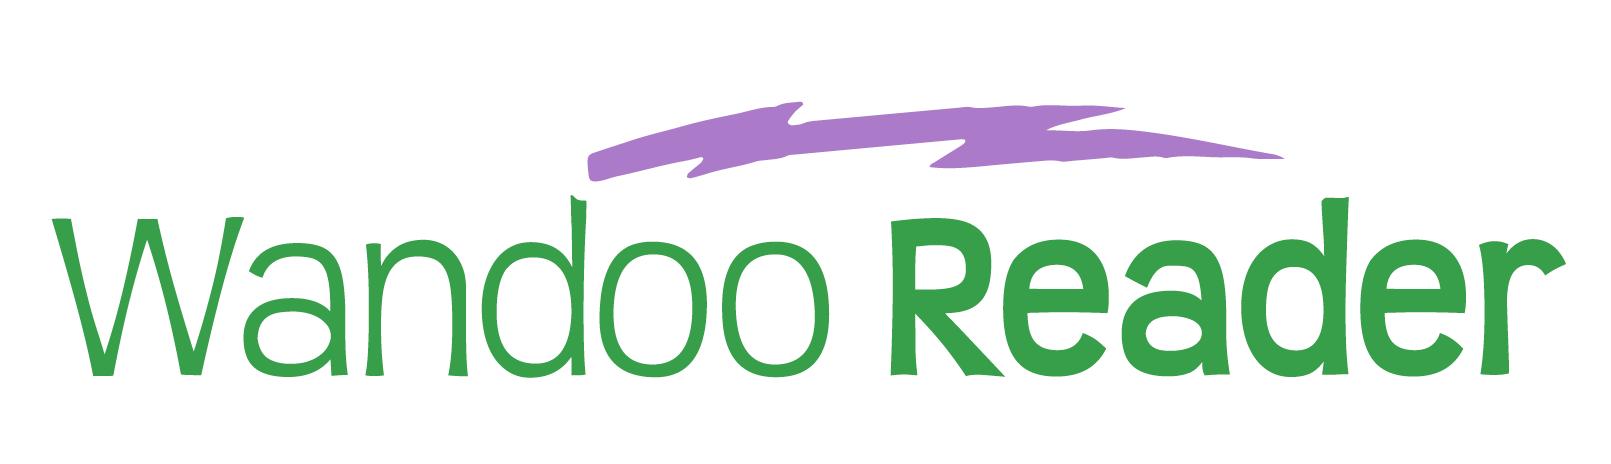 Wandoo Reader Logo Horizontal